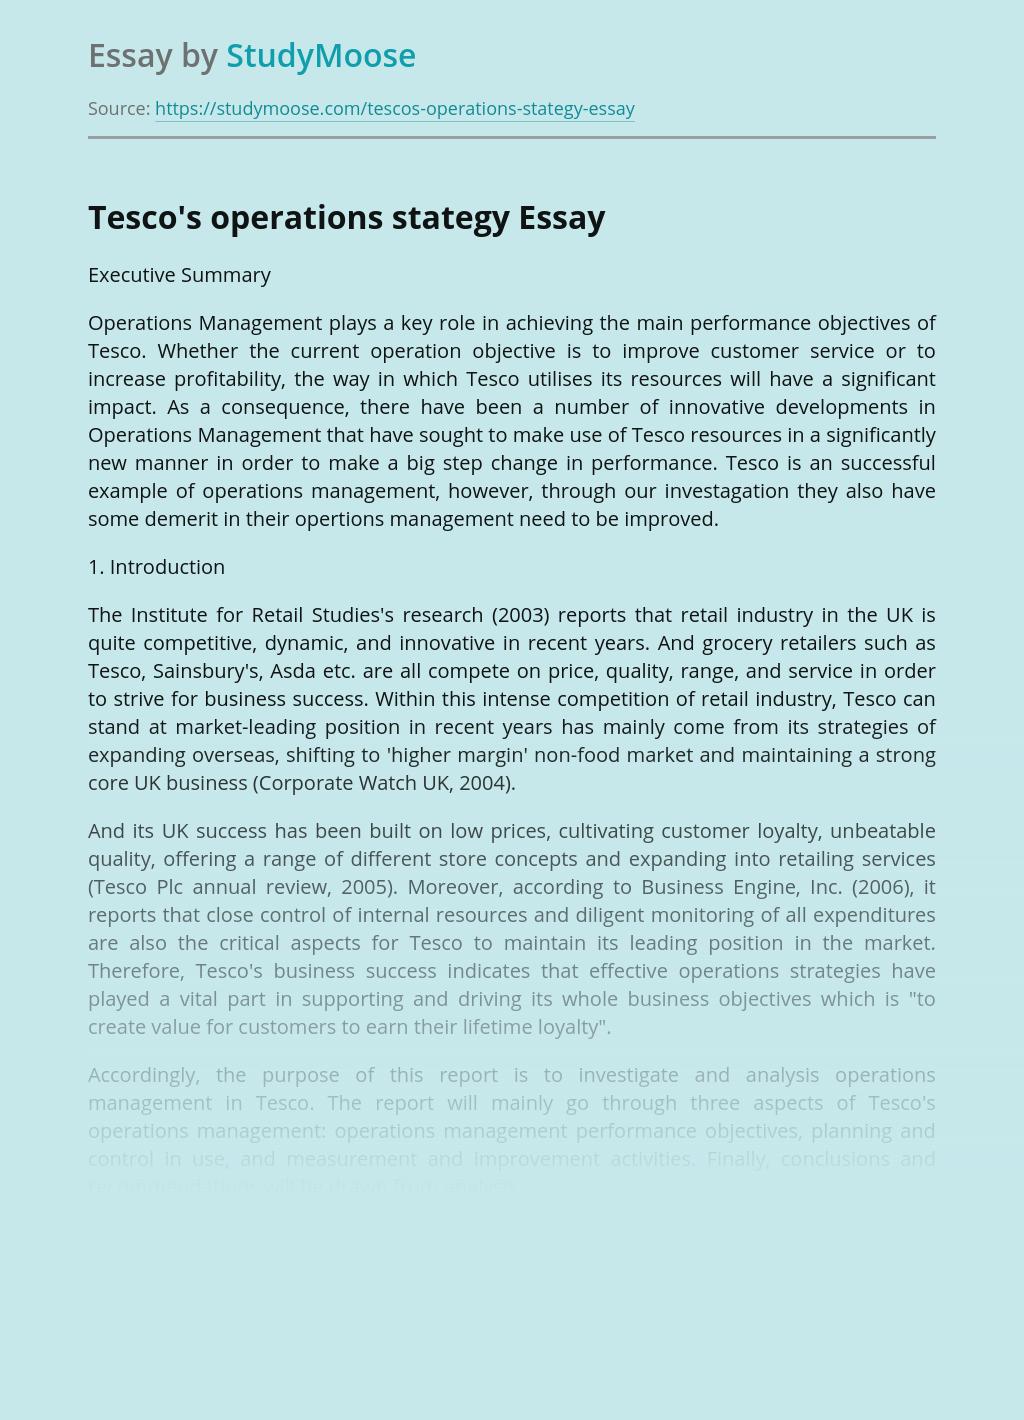 Tesco's operations stategy